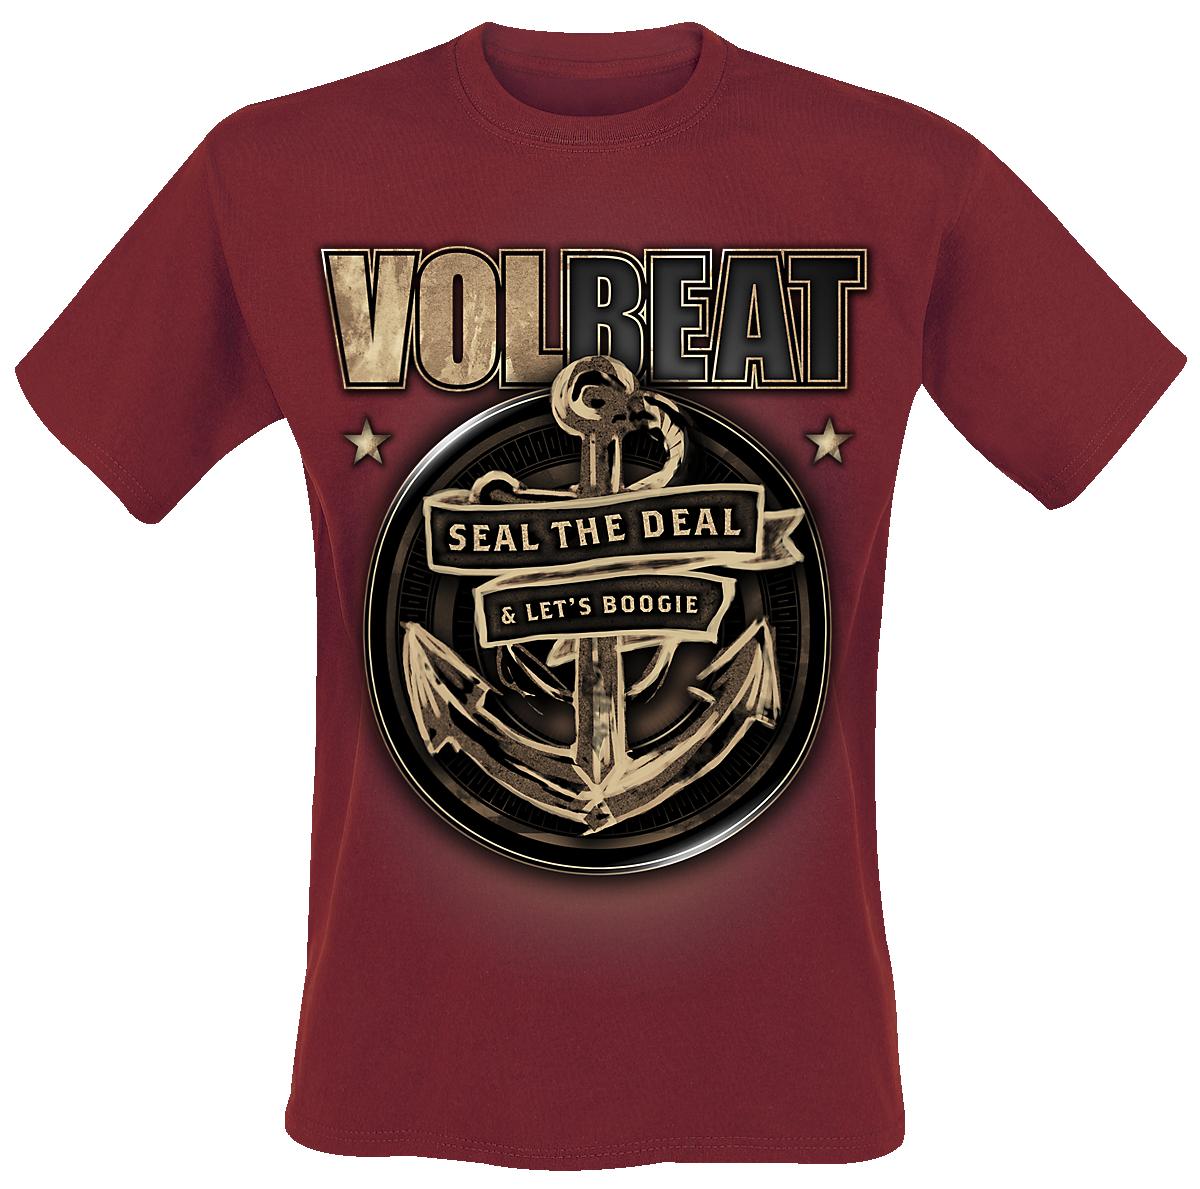 Volbeat - Anchor - T-Shirt - dark red image